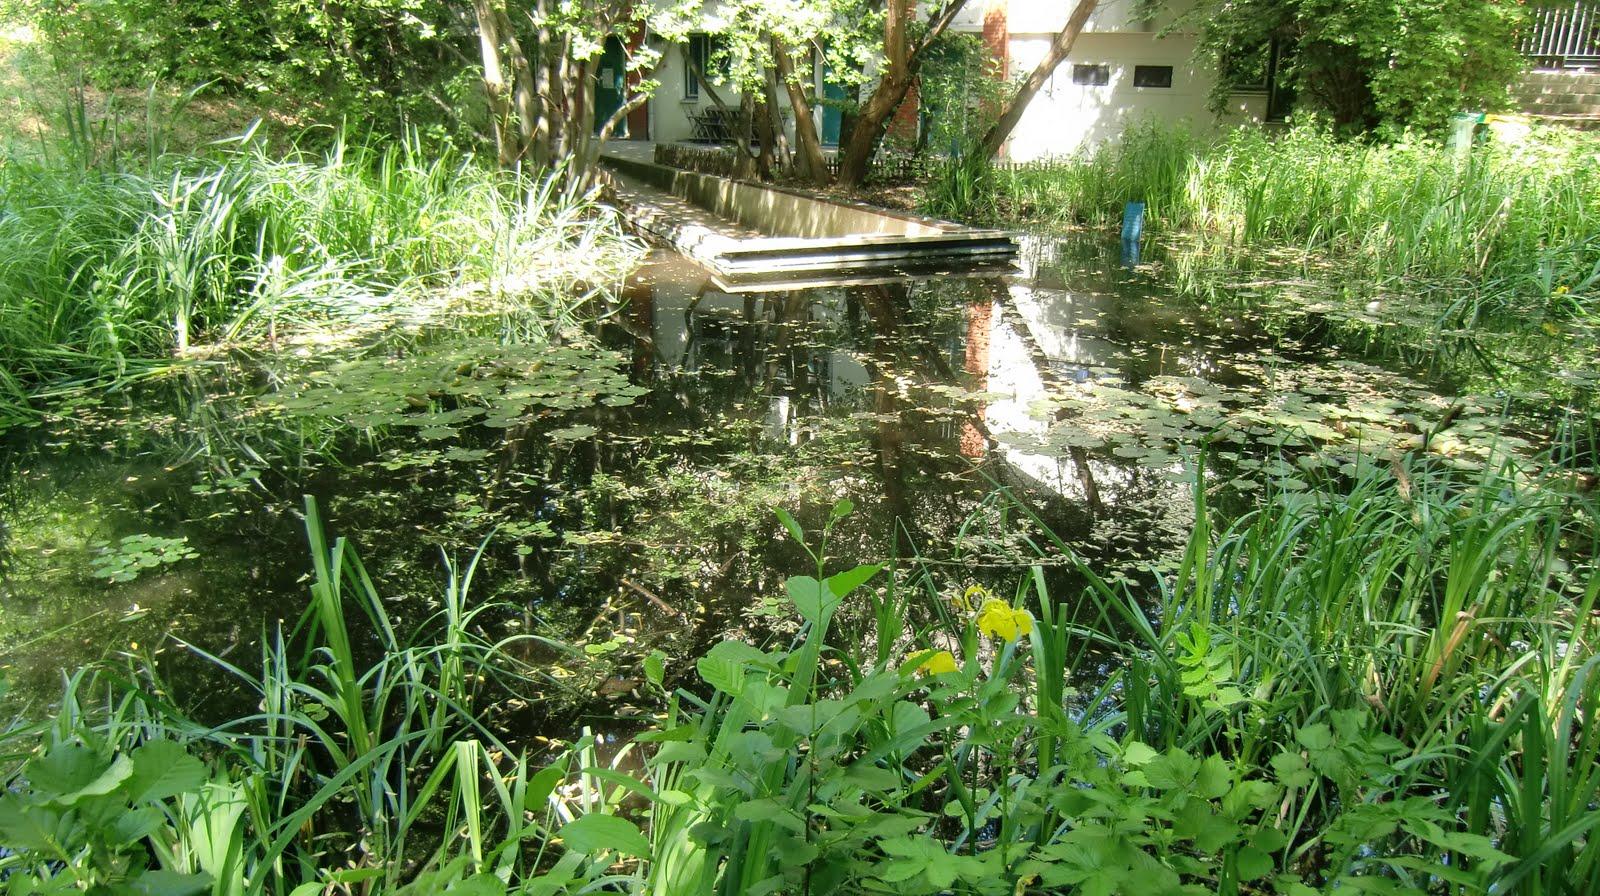 Promenade d 39 une fleur urbaine pause au jardin naturel for Jardin naturel